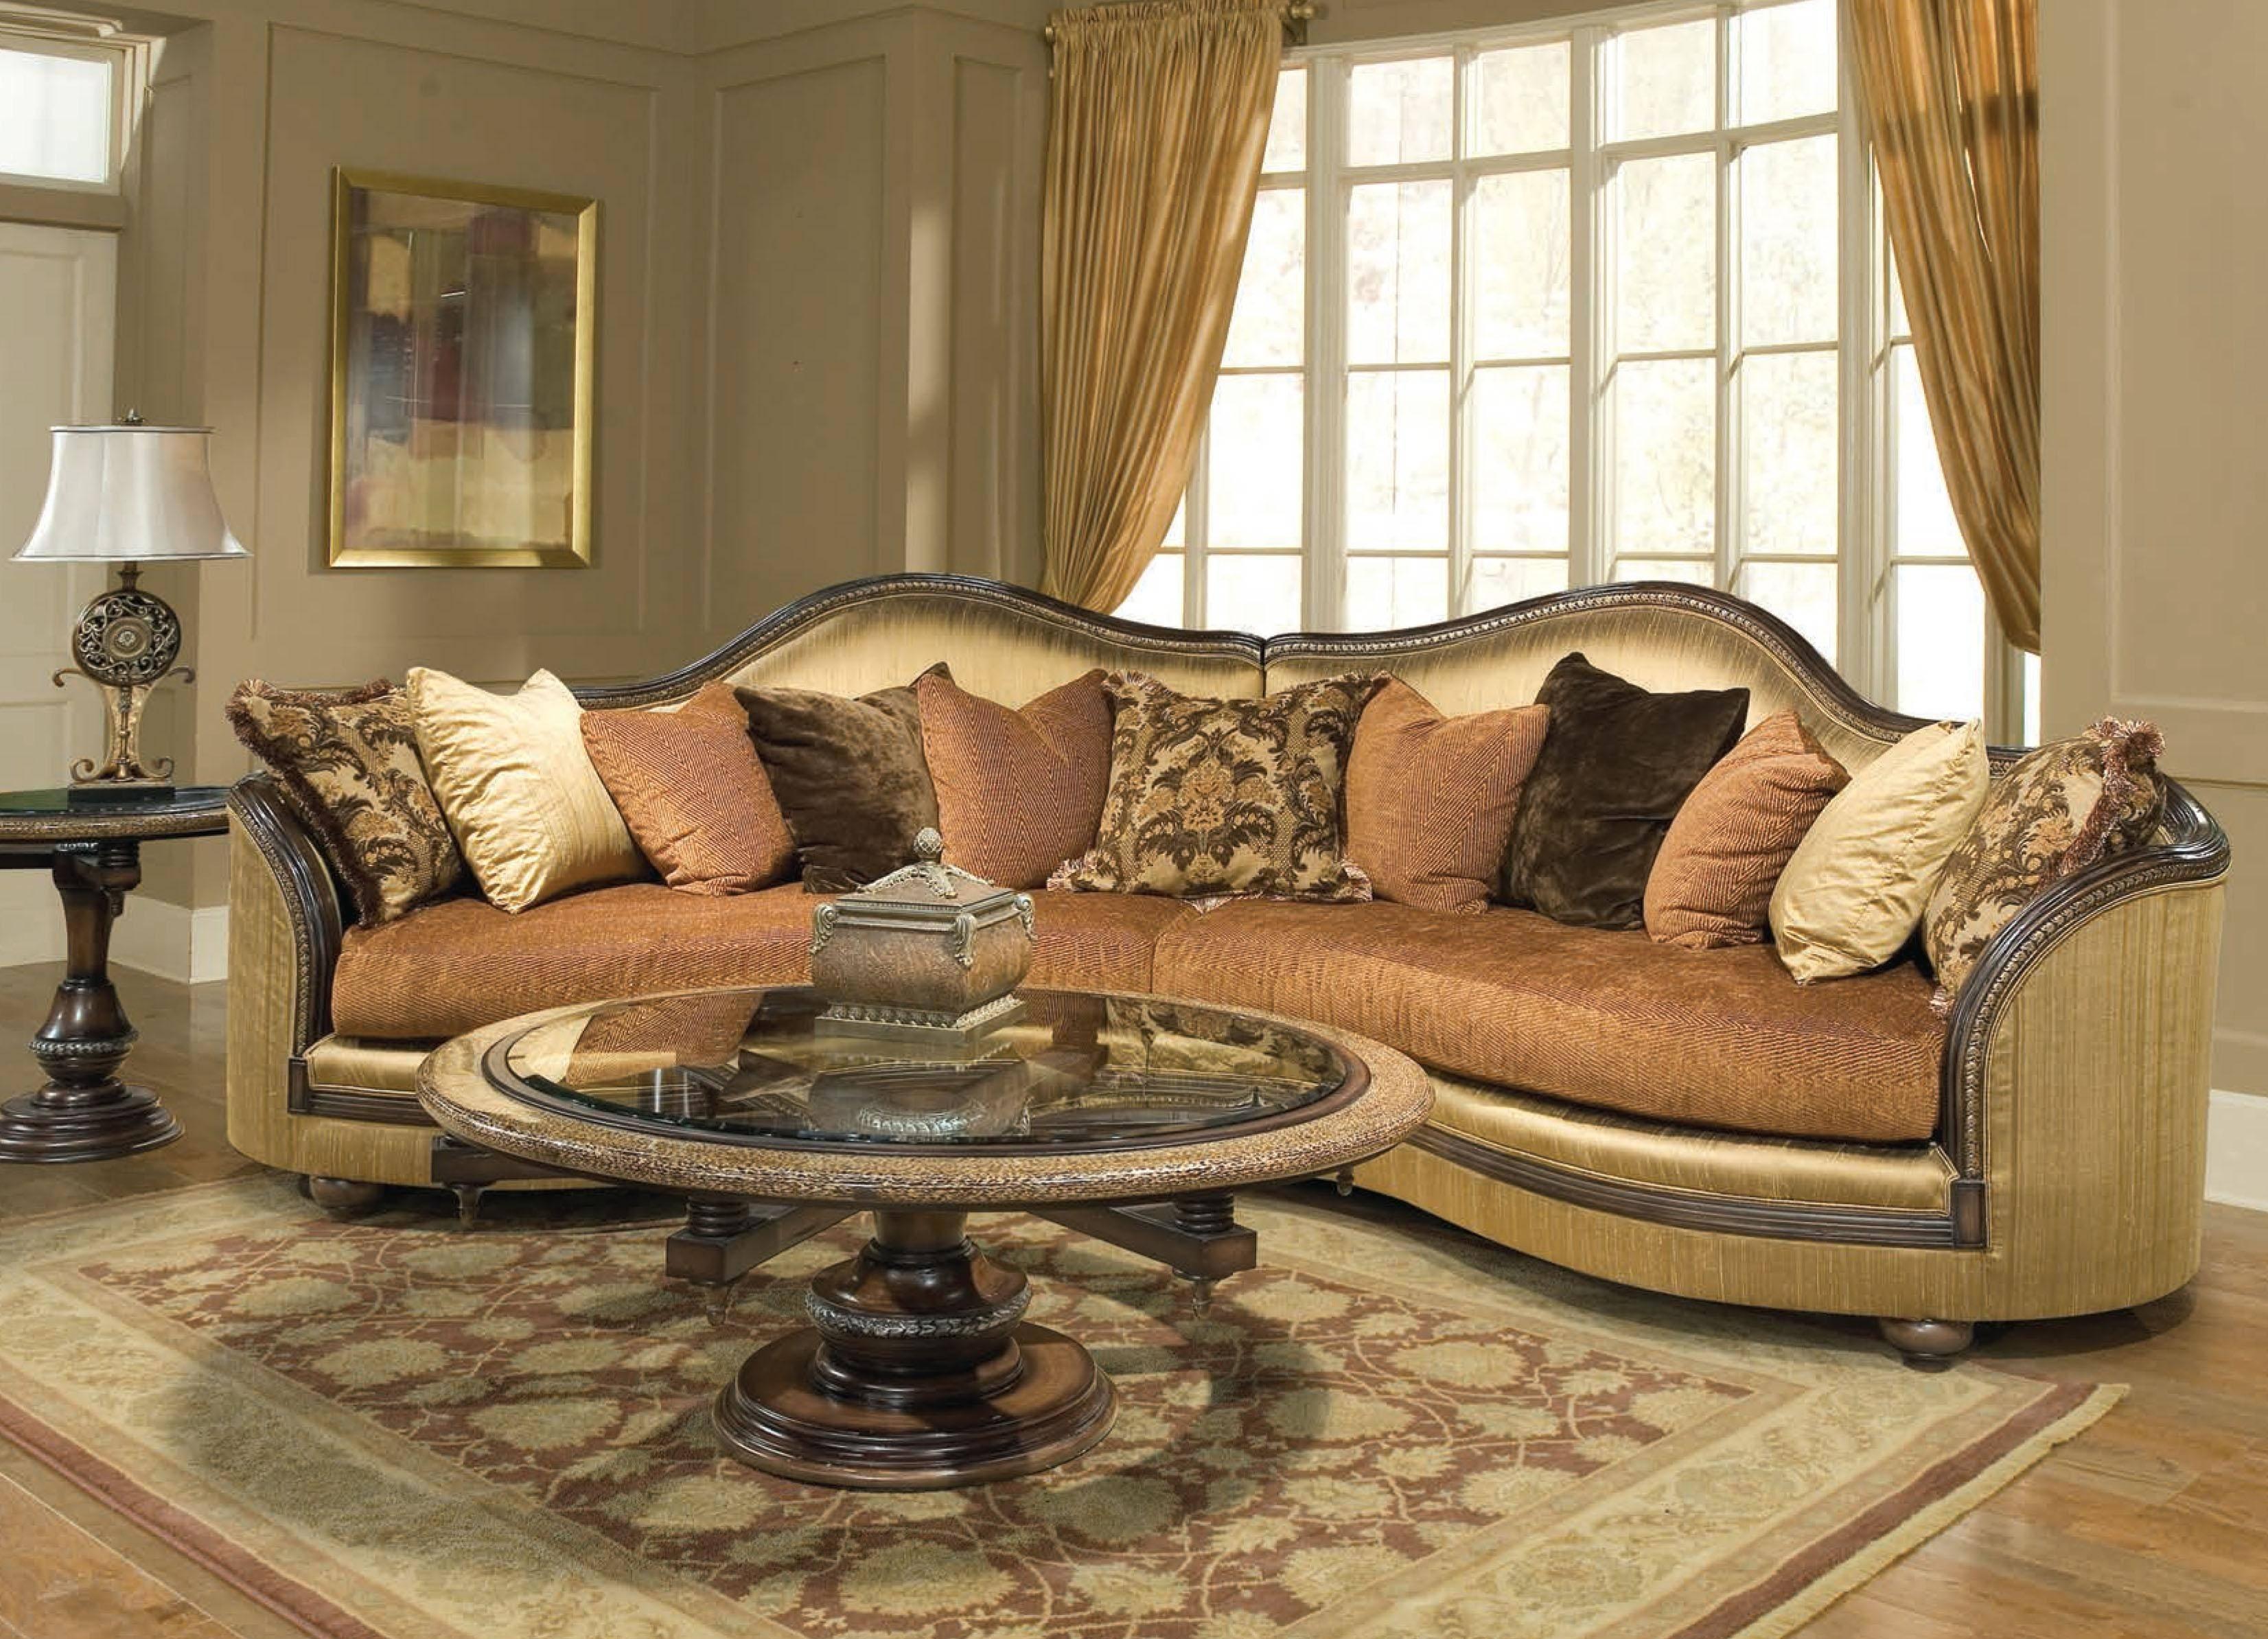 benetti s ancona sectional sofa in beige bronze gold dark brown chenille